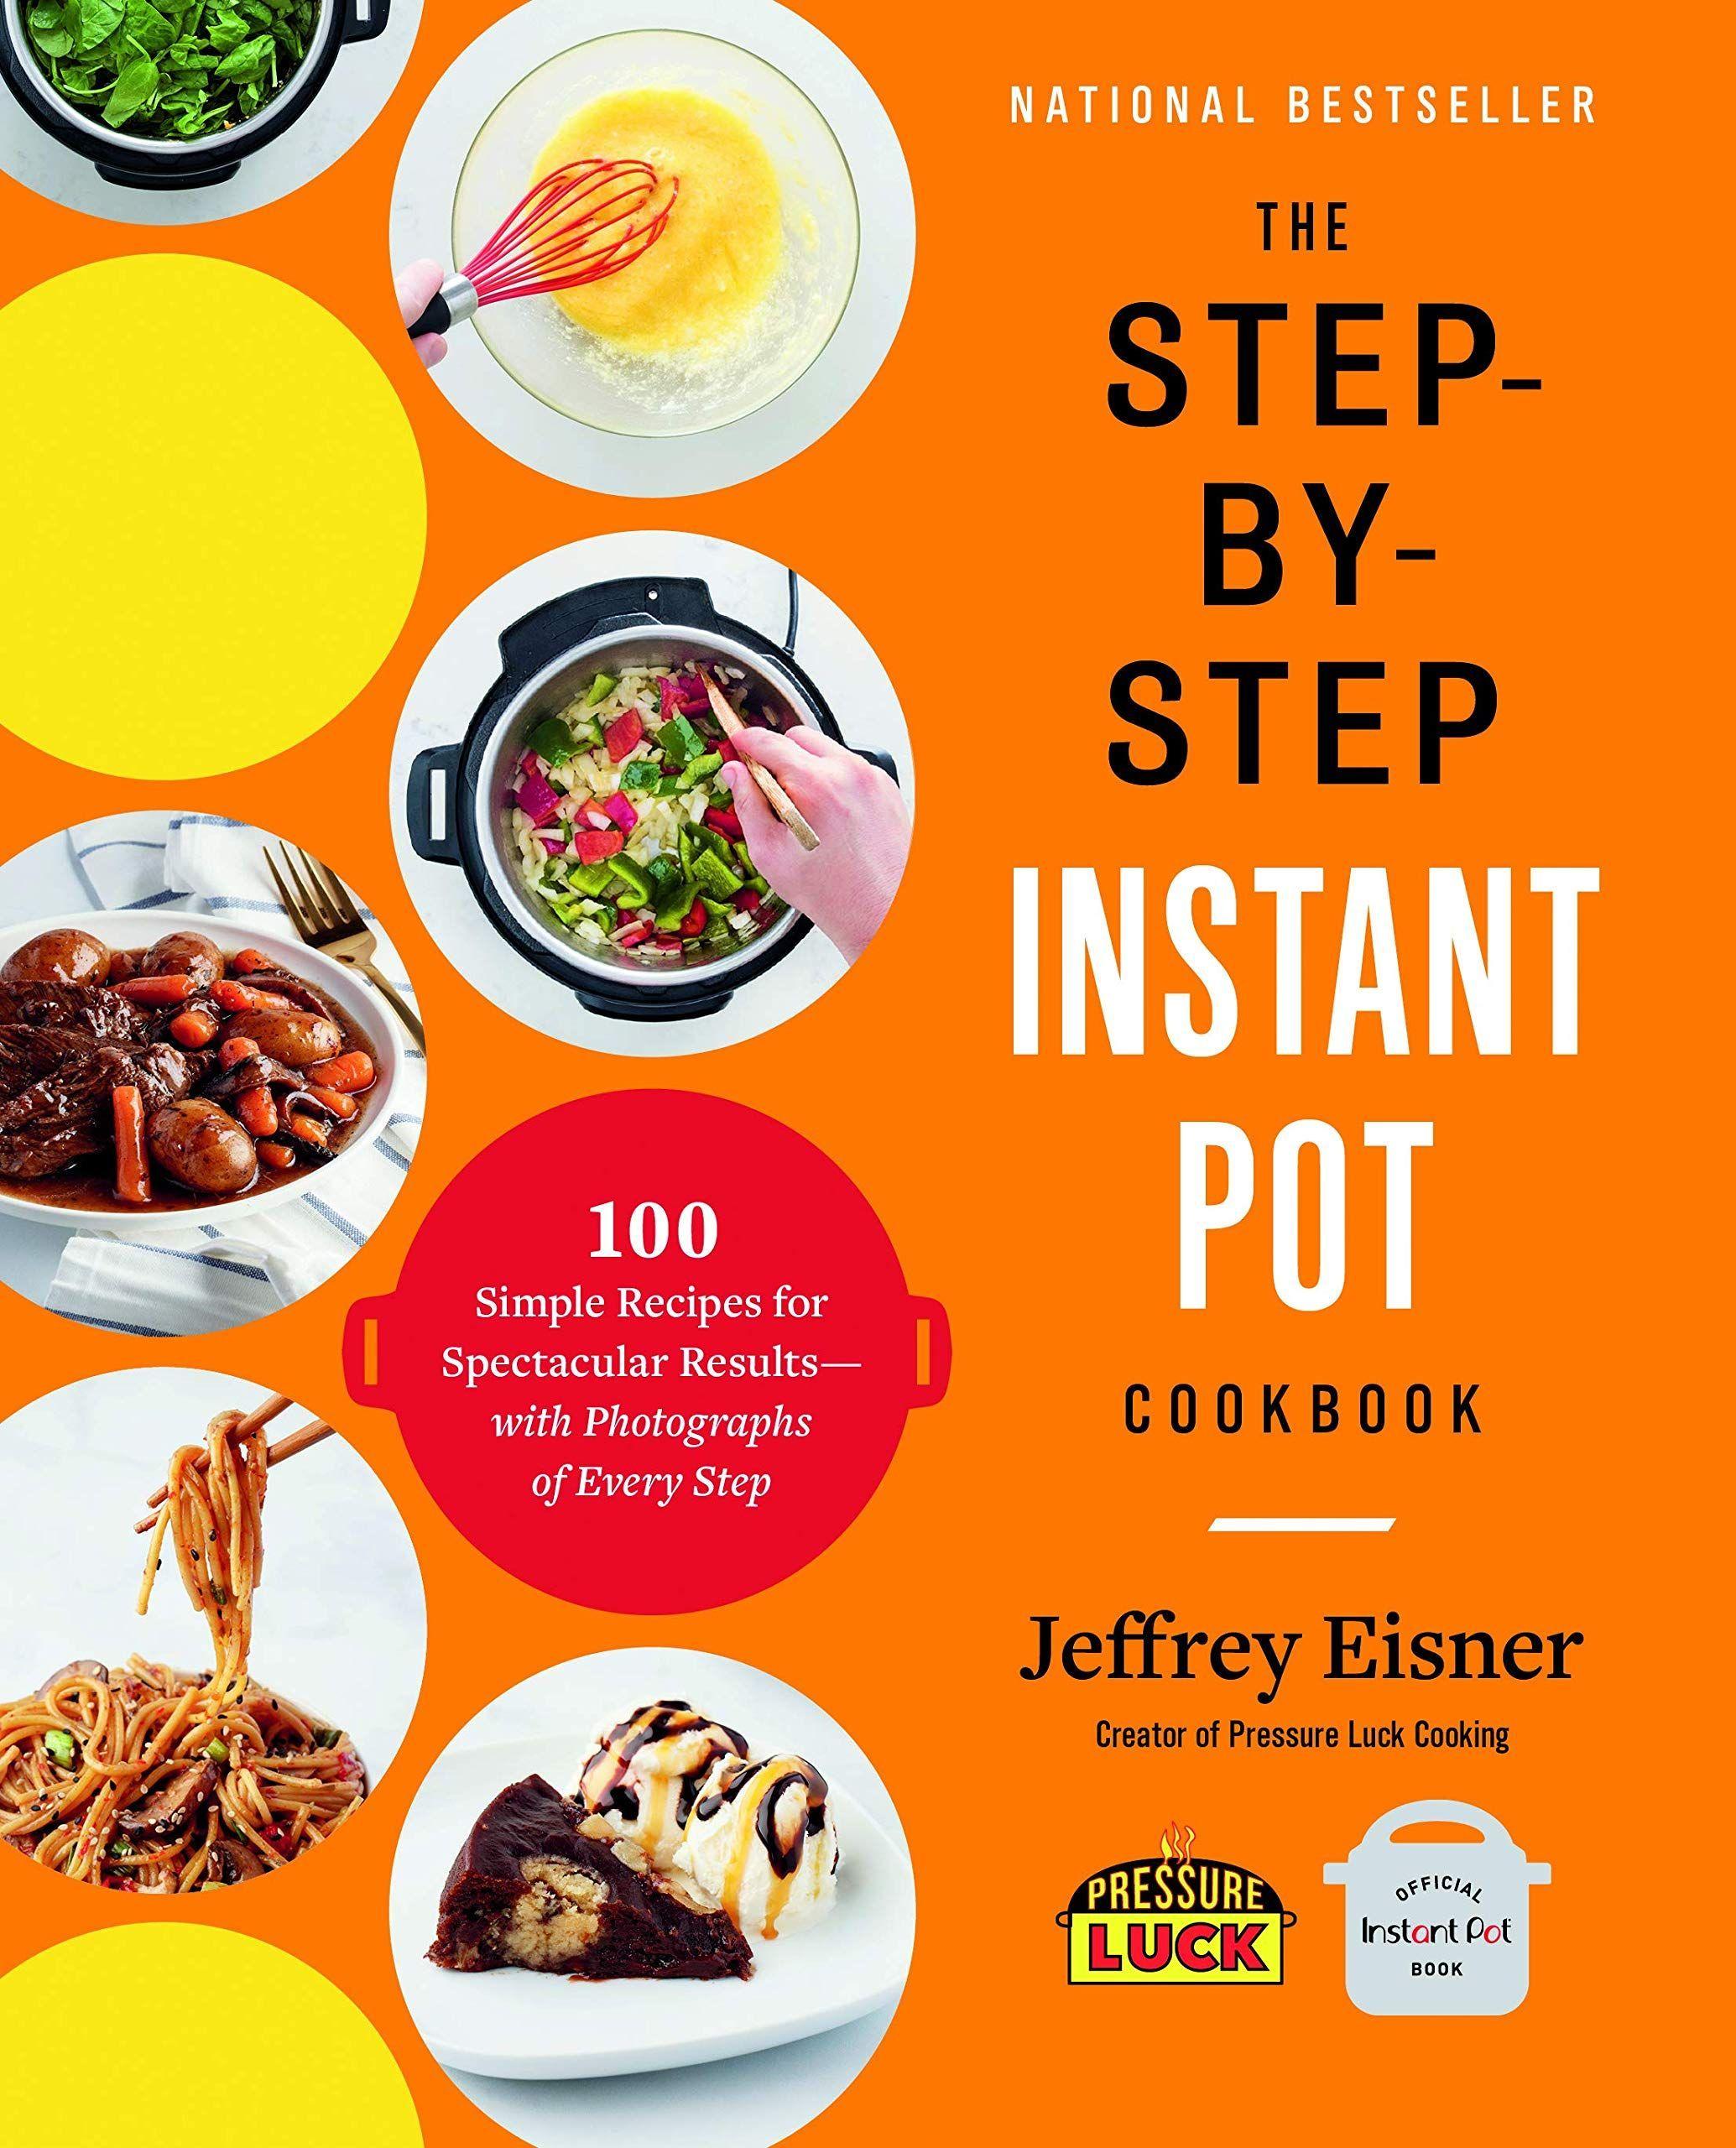 20 Best Instant Pot Cookbooks 2021 Top Pressure Cooker Cookbooks